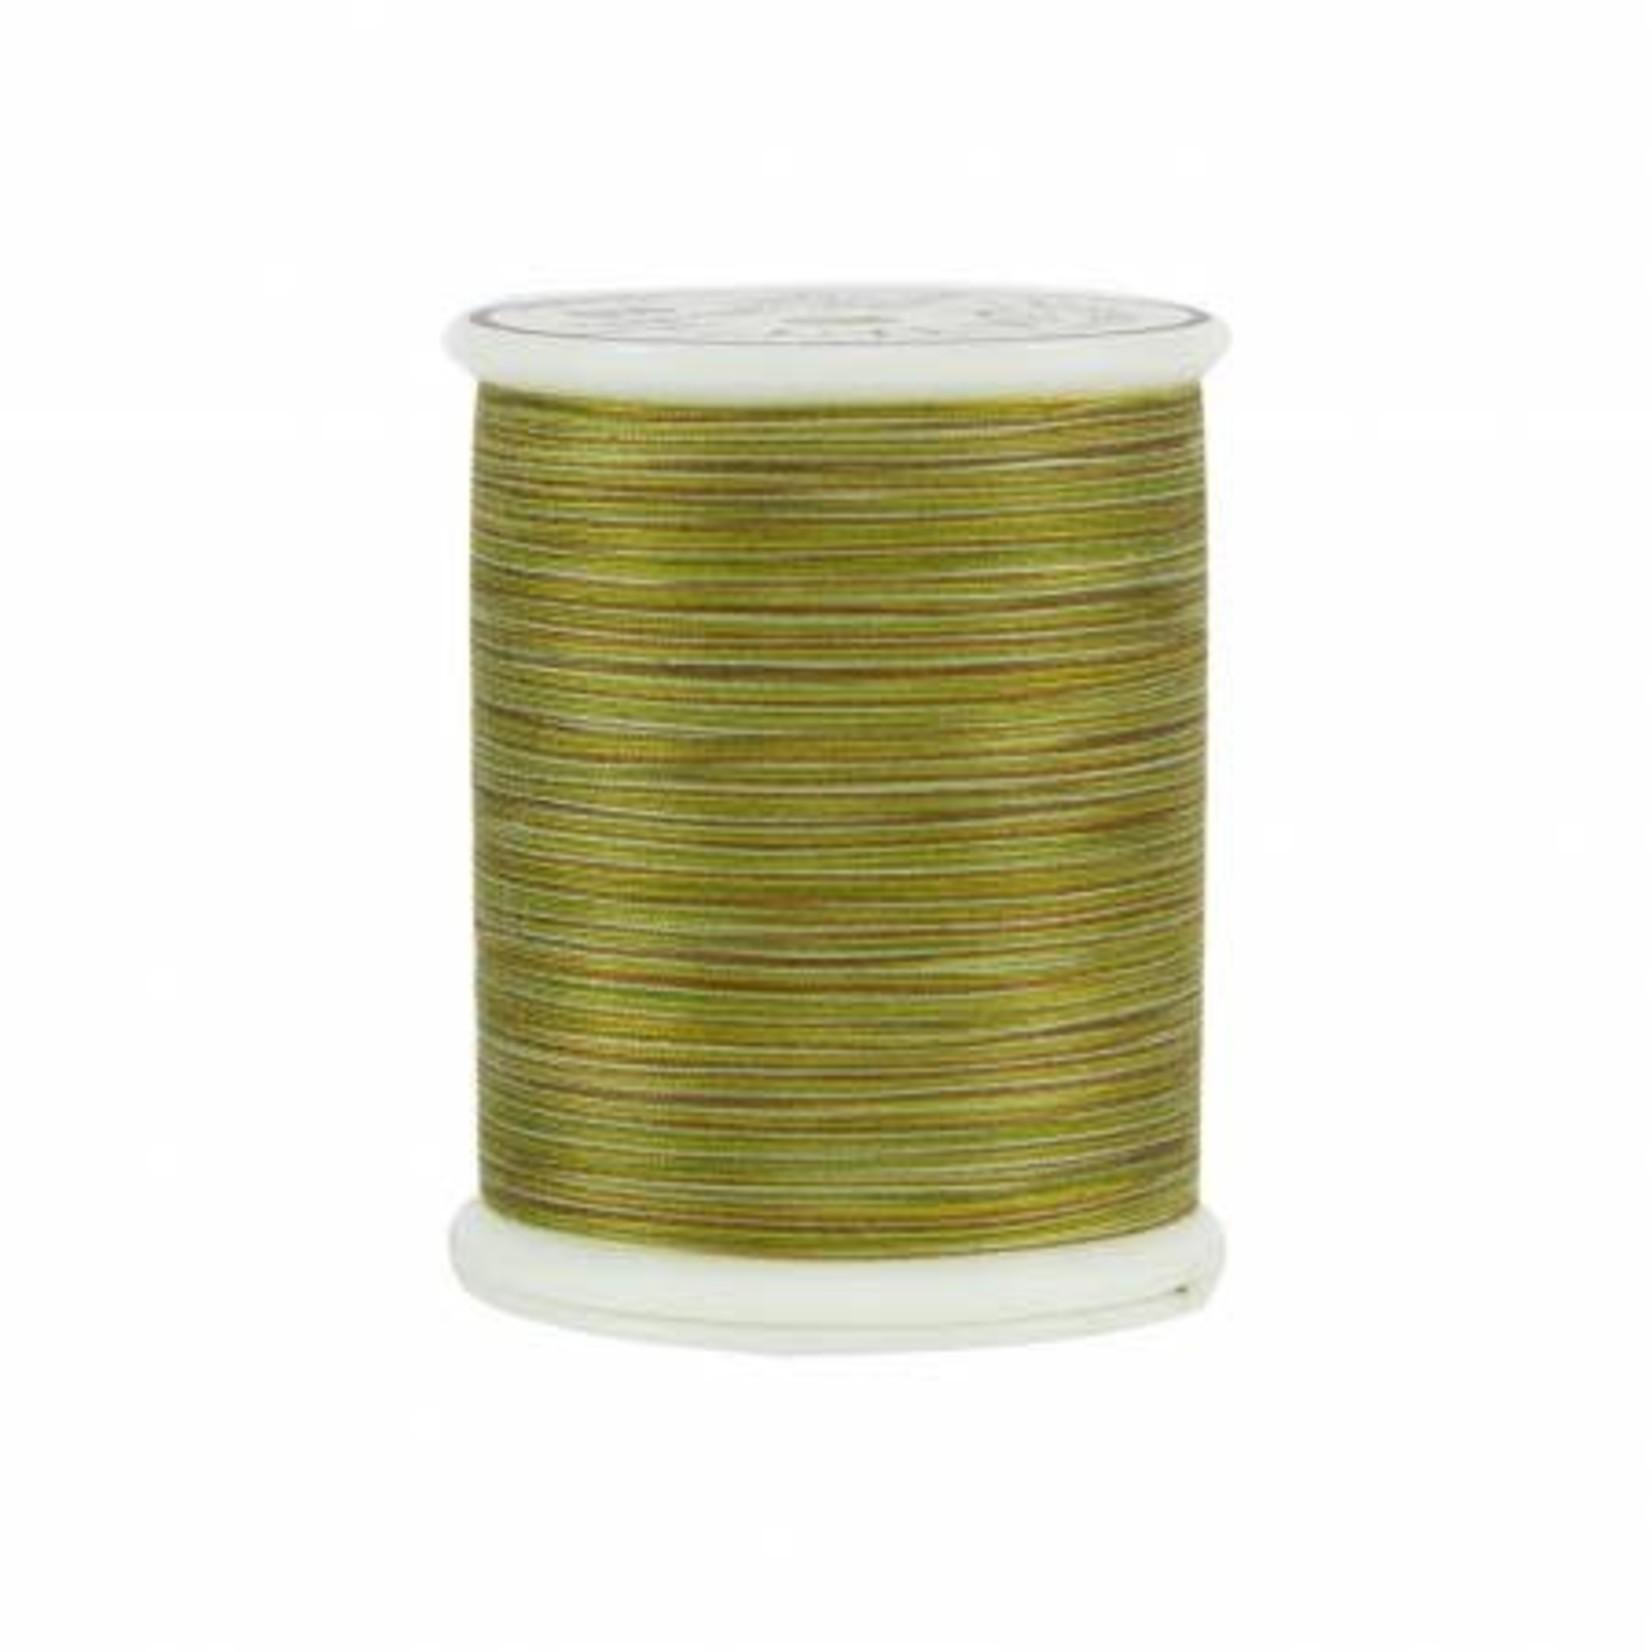 Superior Threads King Tut - #40 - 457 m - 0910 Bulrushes